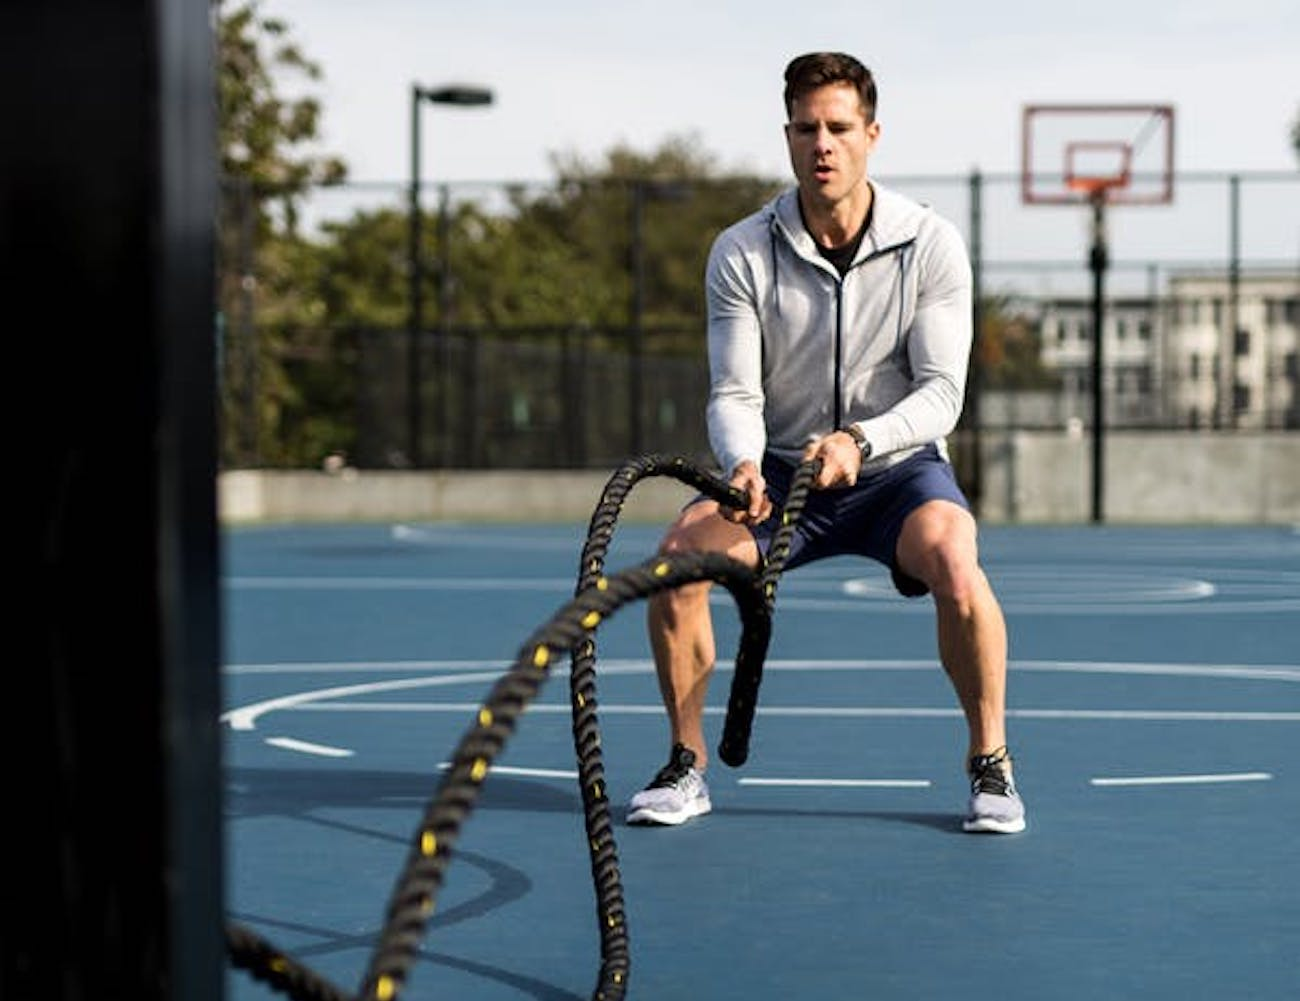 TRX Exercise Battle Rope